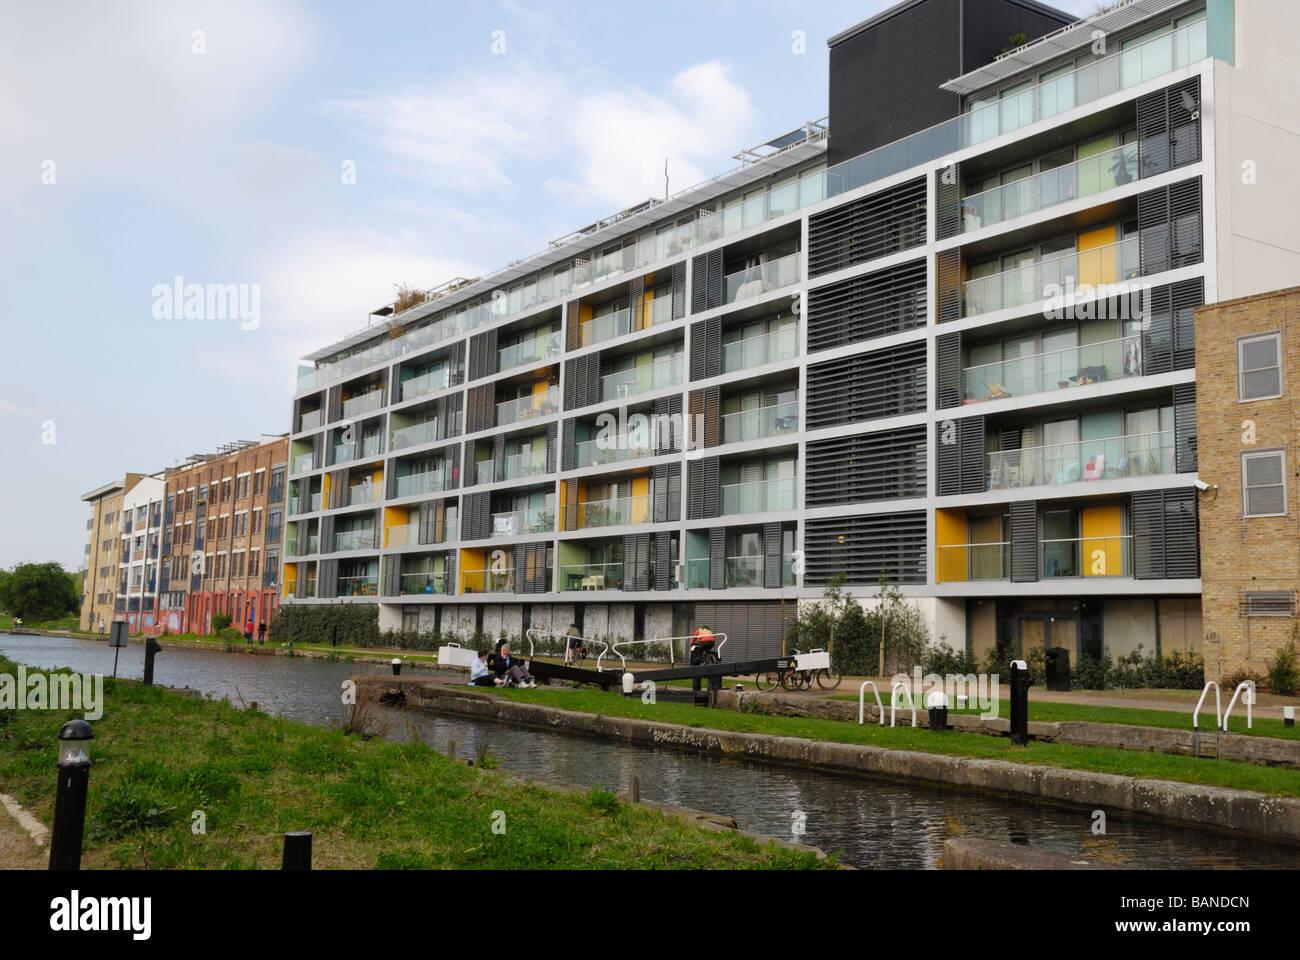 New residential apartment development next to Johnson's Lock on